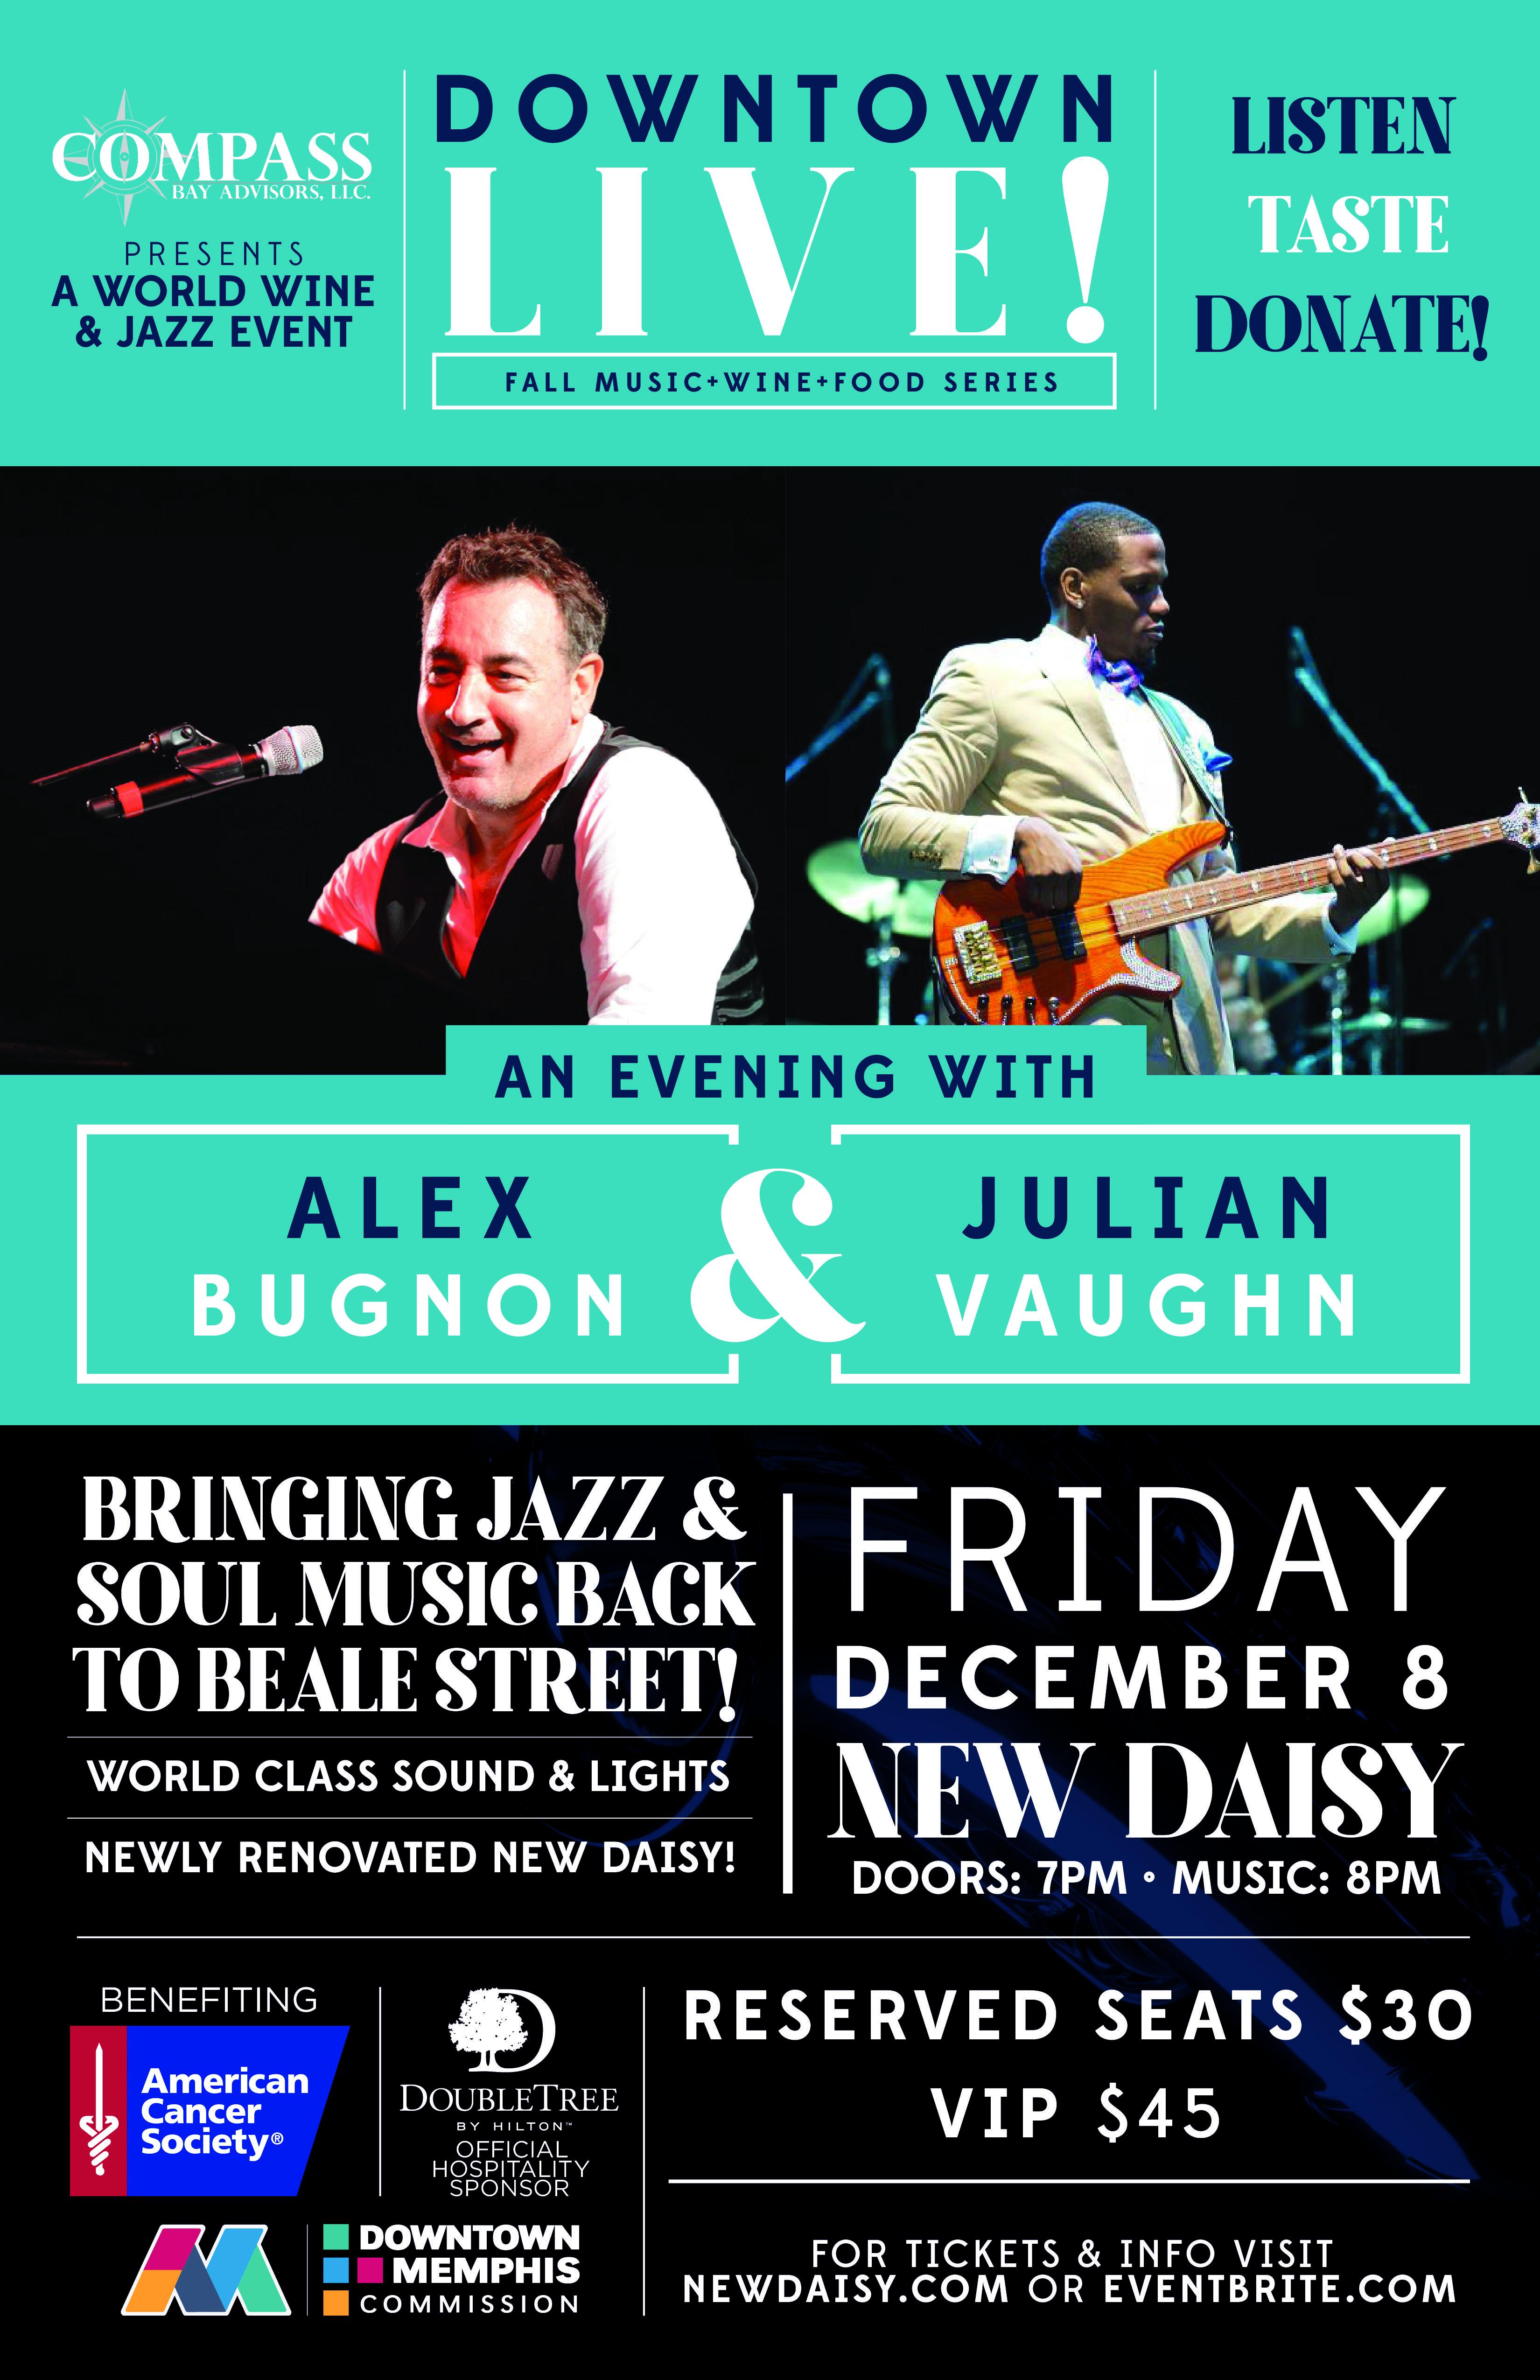 Downtown Live! an Evening With Alex Bugnon and Julian Vaughn!   Memphis, TN   New Daisy Theatre   December 8, 2017